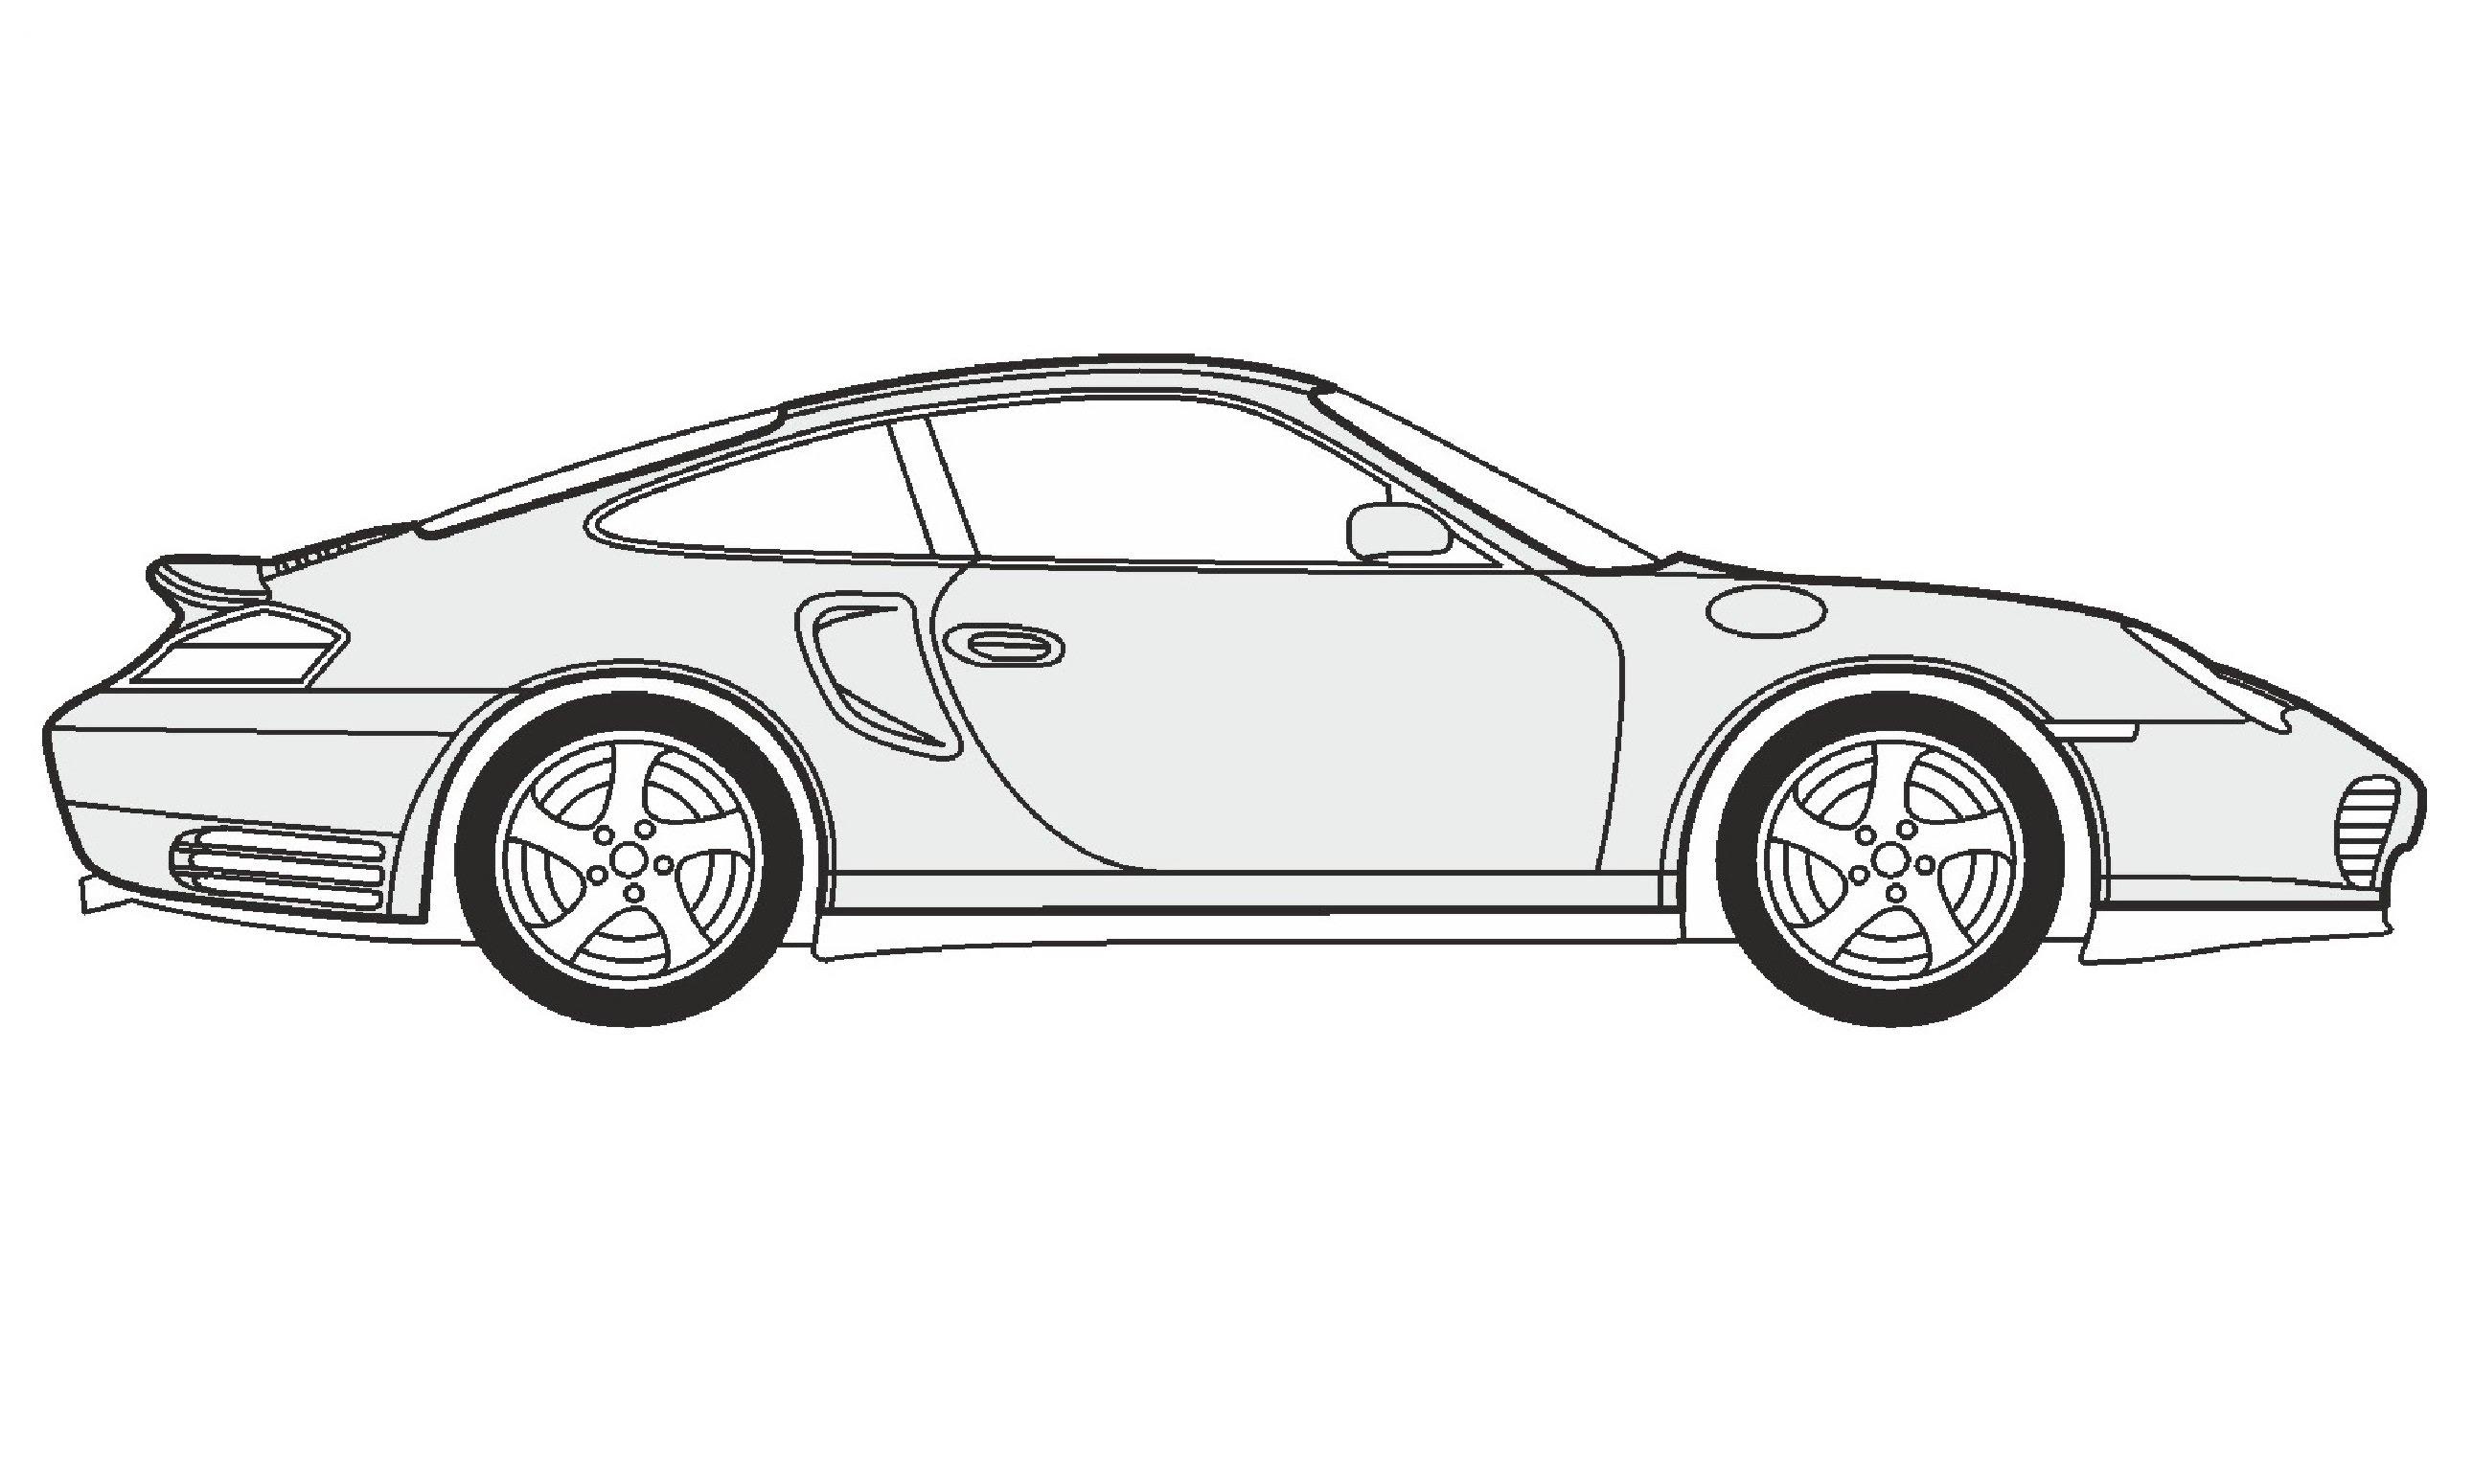 Drawn vehicle porsche 911 Porsche / Turbo Turbo нарисовать